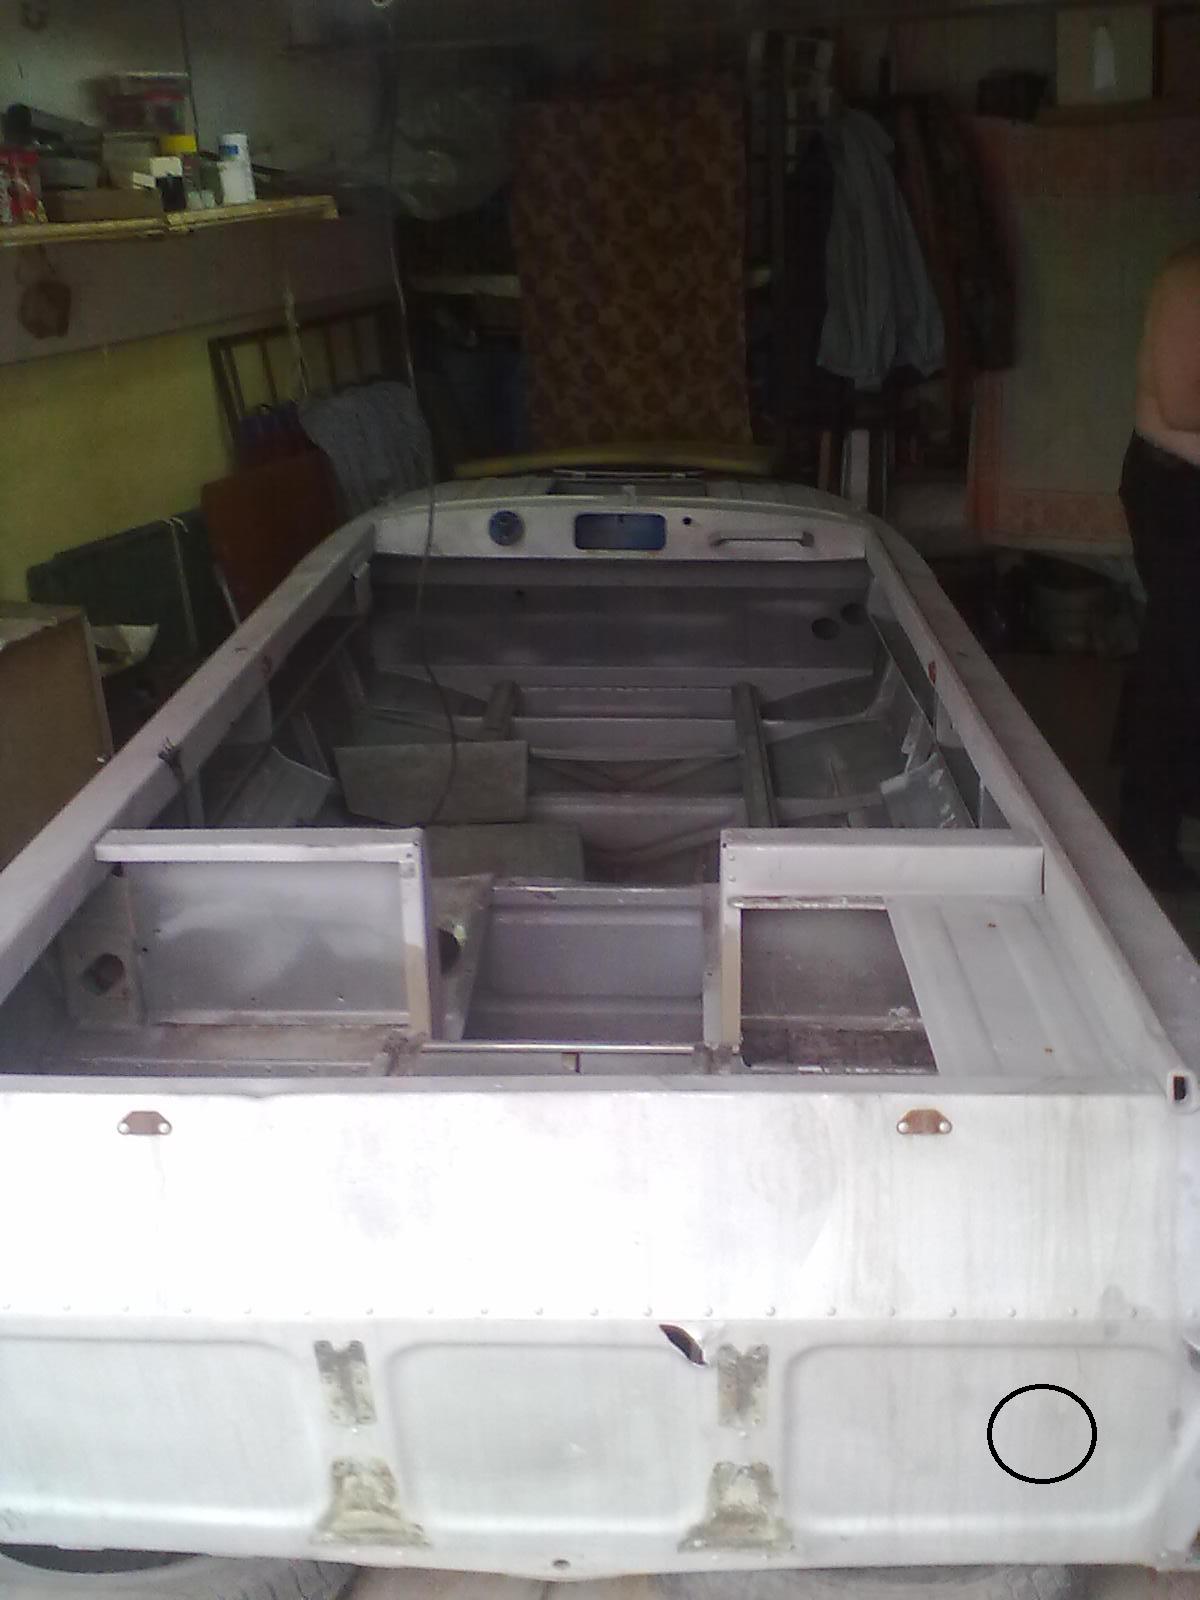 где номер на лодке казанка 5м2